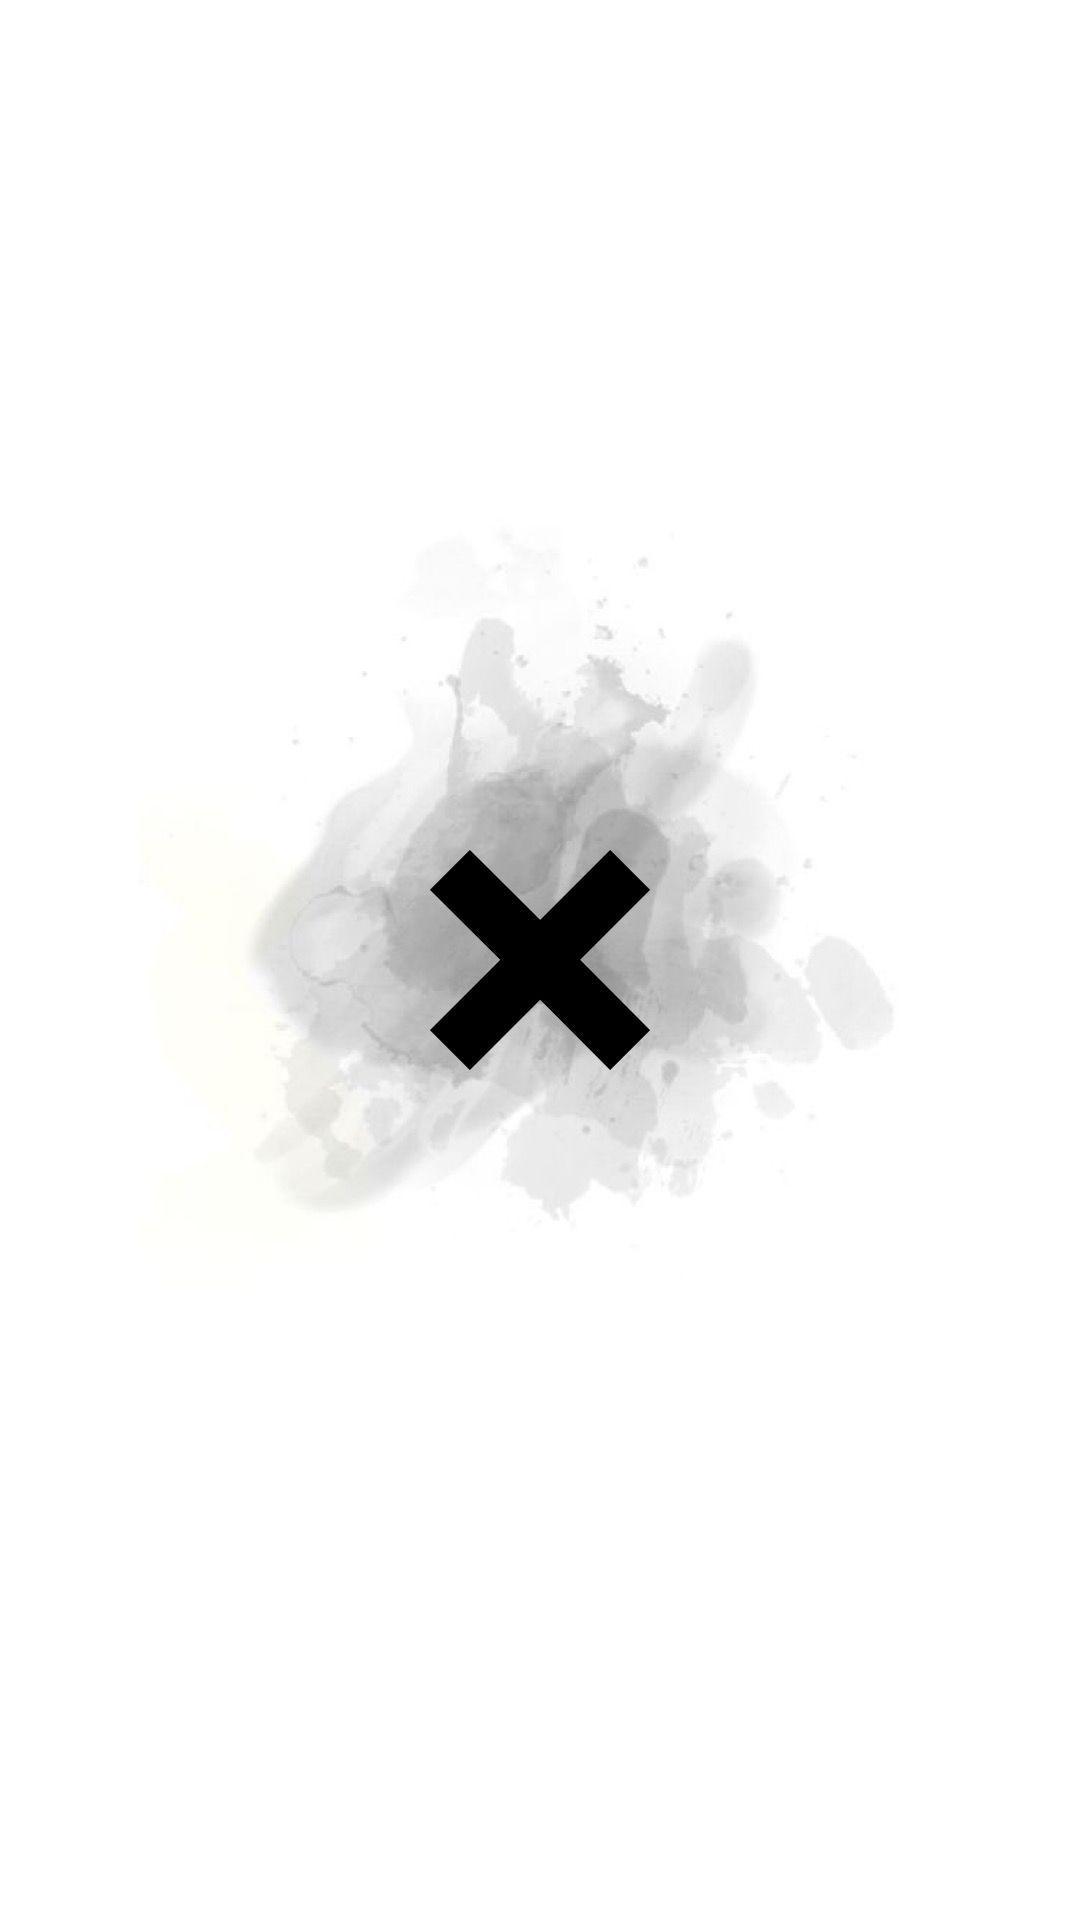 part icon   Instagram icons, Instagram logo, Instagram highlight icons